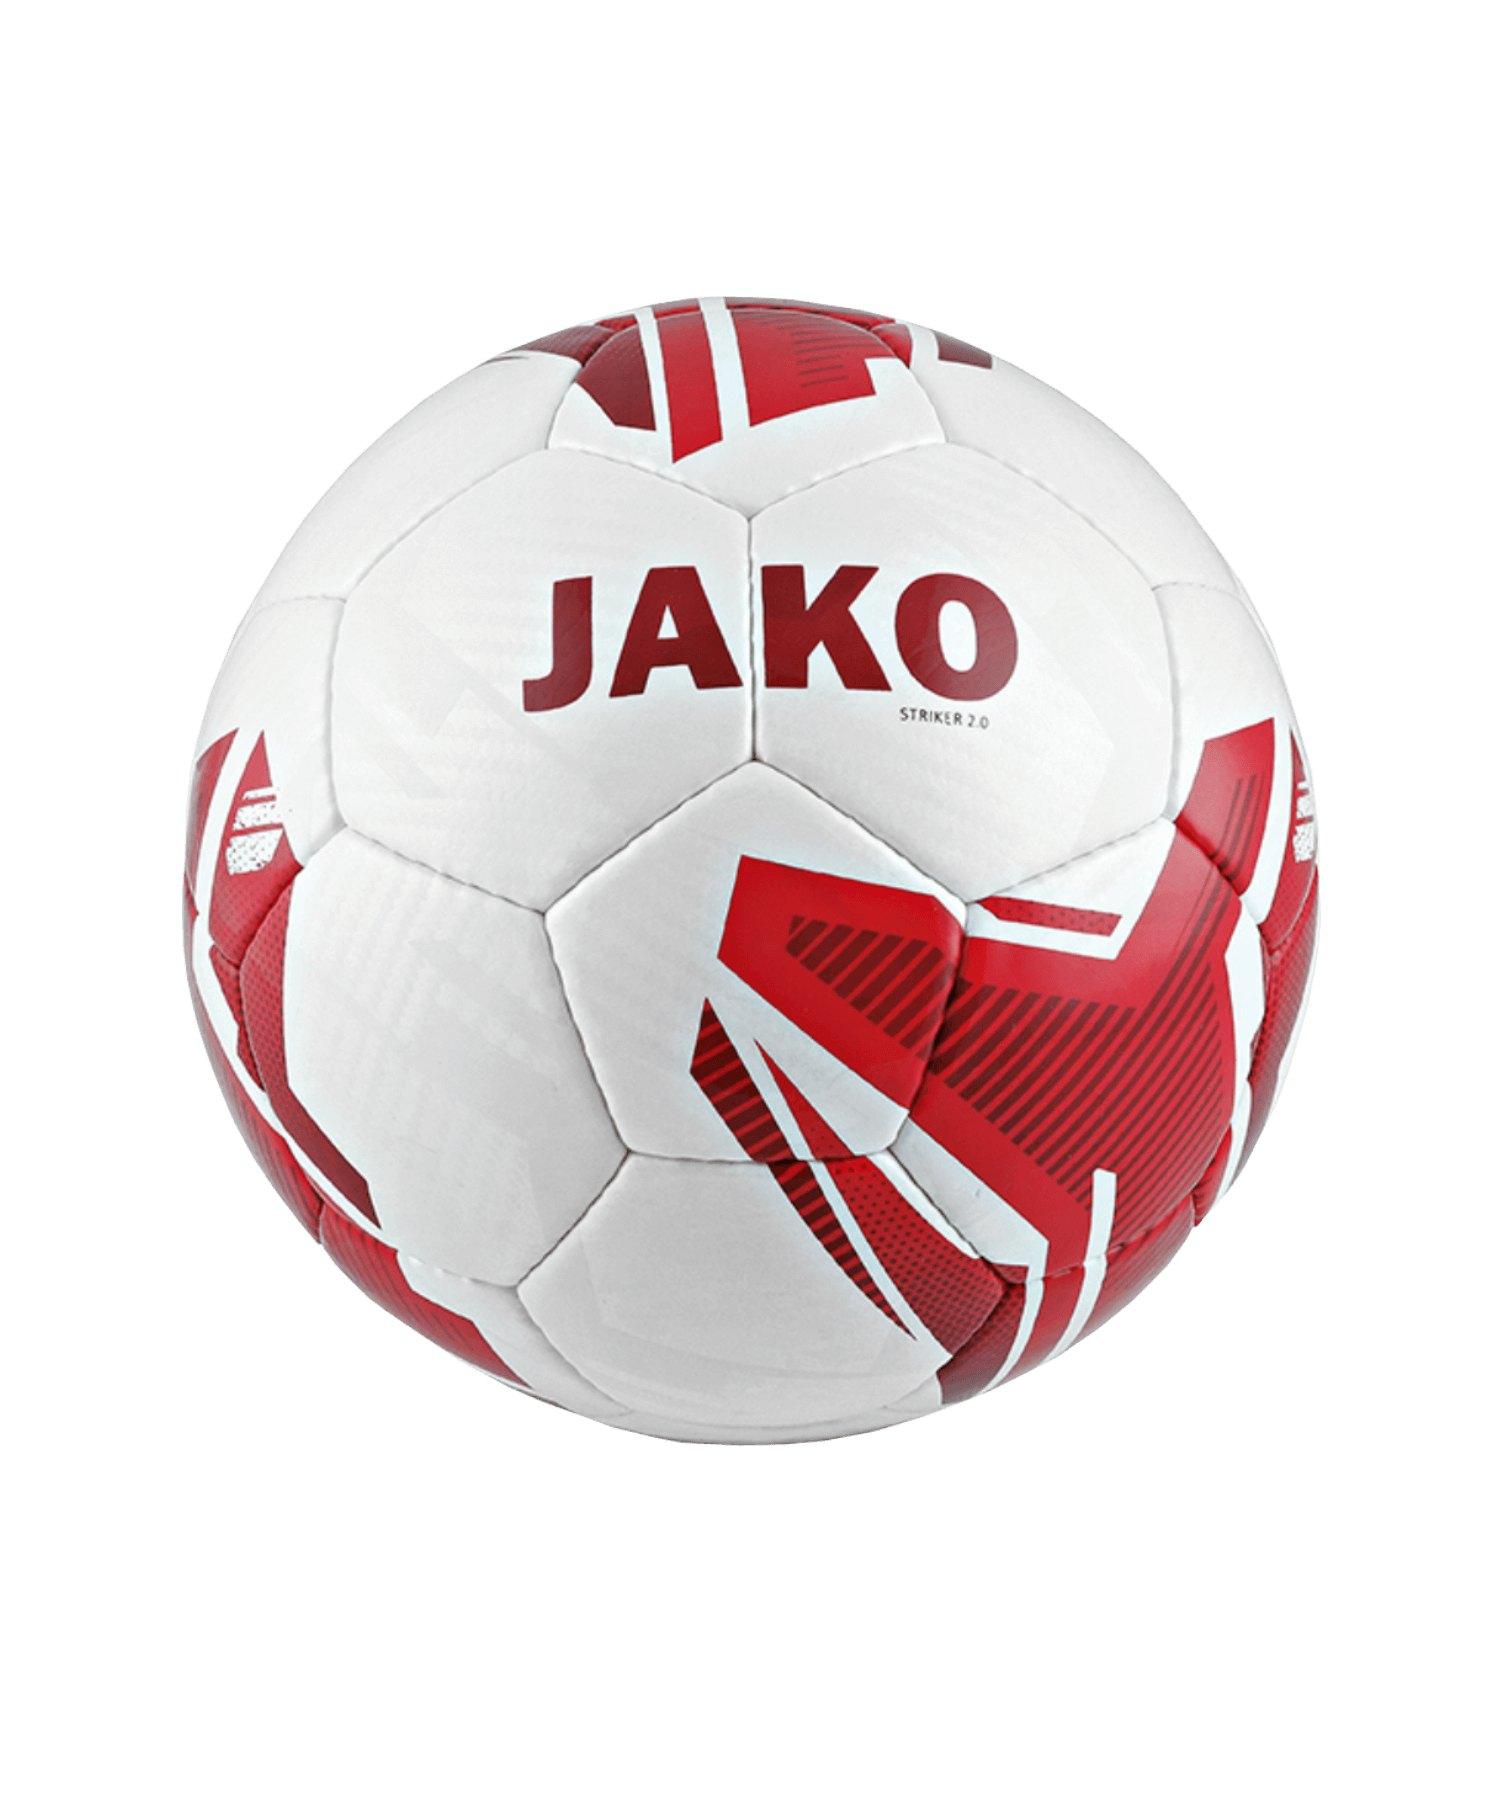 JAKO Striker 2.0 Trainingsball Weiss Rot F01 - Weiss